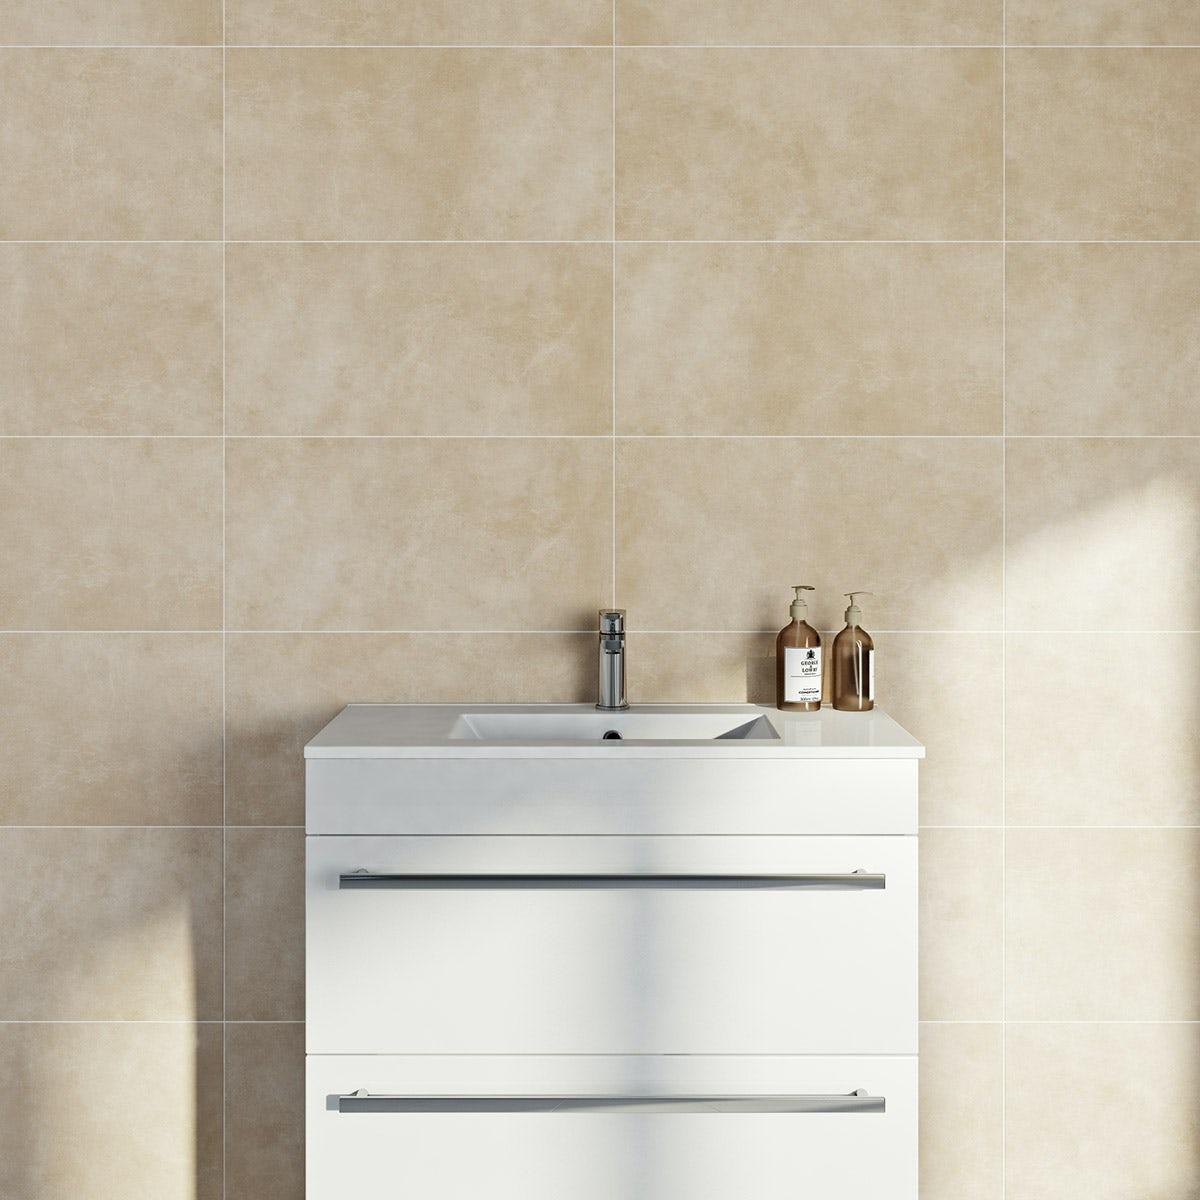 British Ceramic Tile Canvas sand matt tile 298mm x 598mm